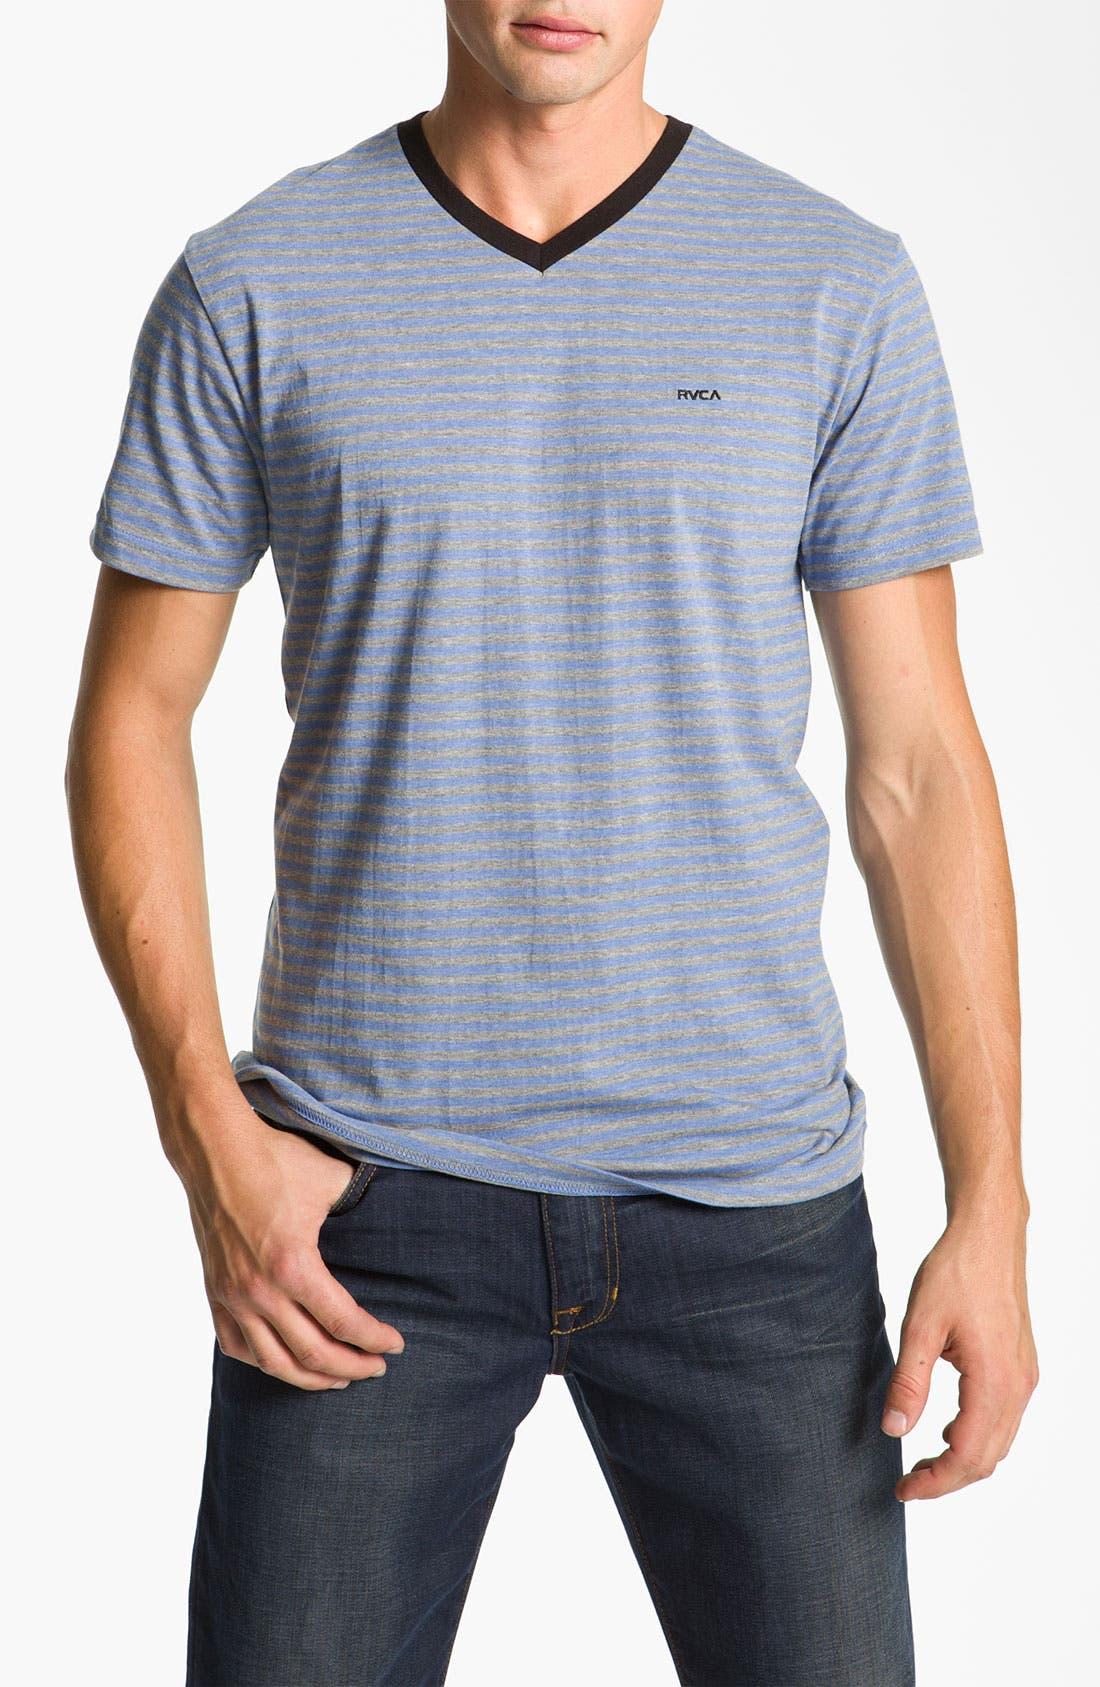 Alternate Image 1 Selected - RVCA 'Grain' Trim Fit V-Neck T-Shirt